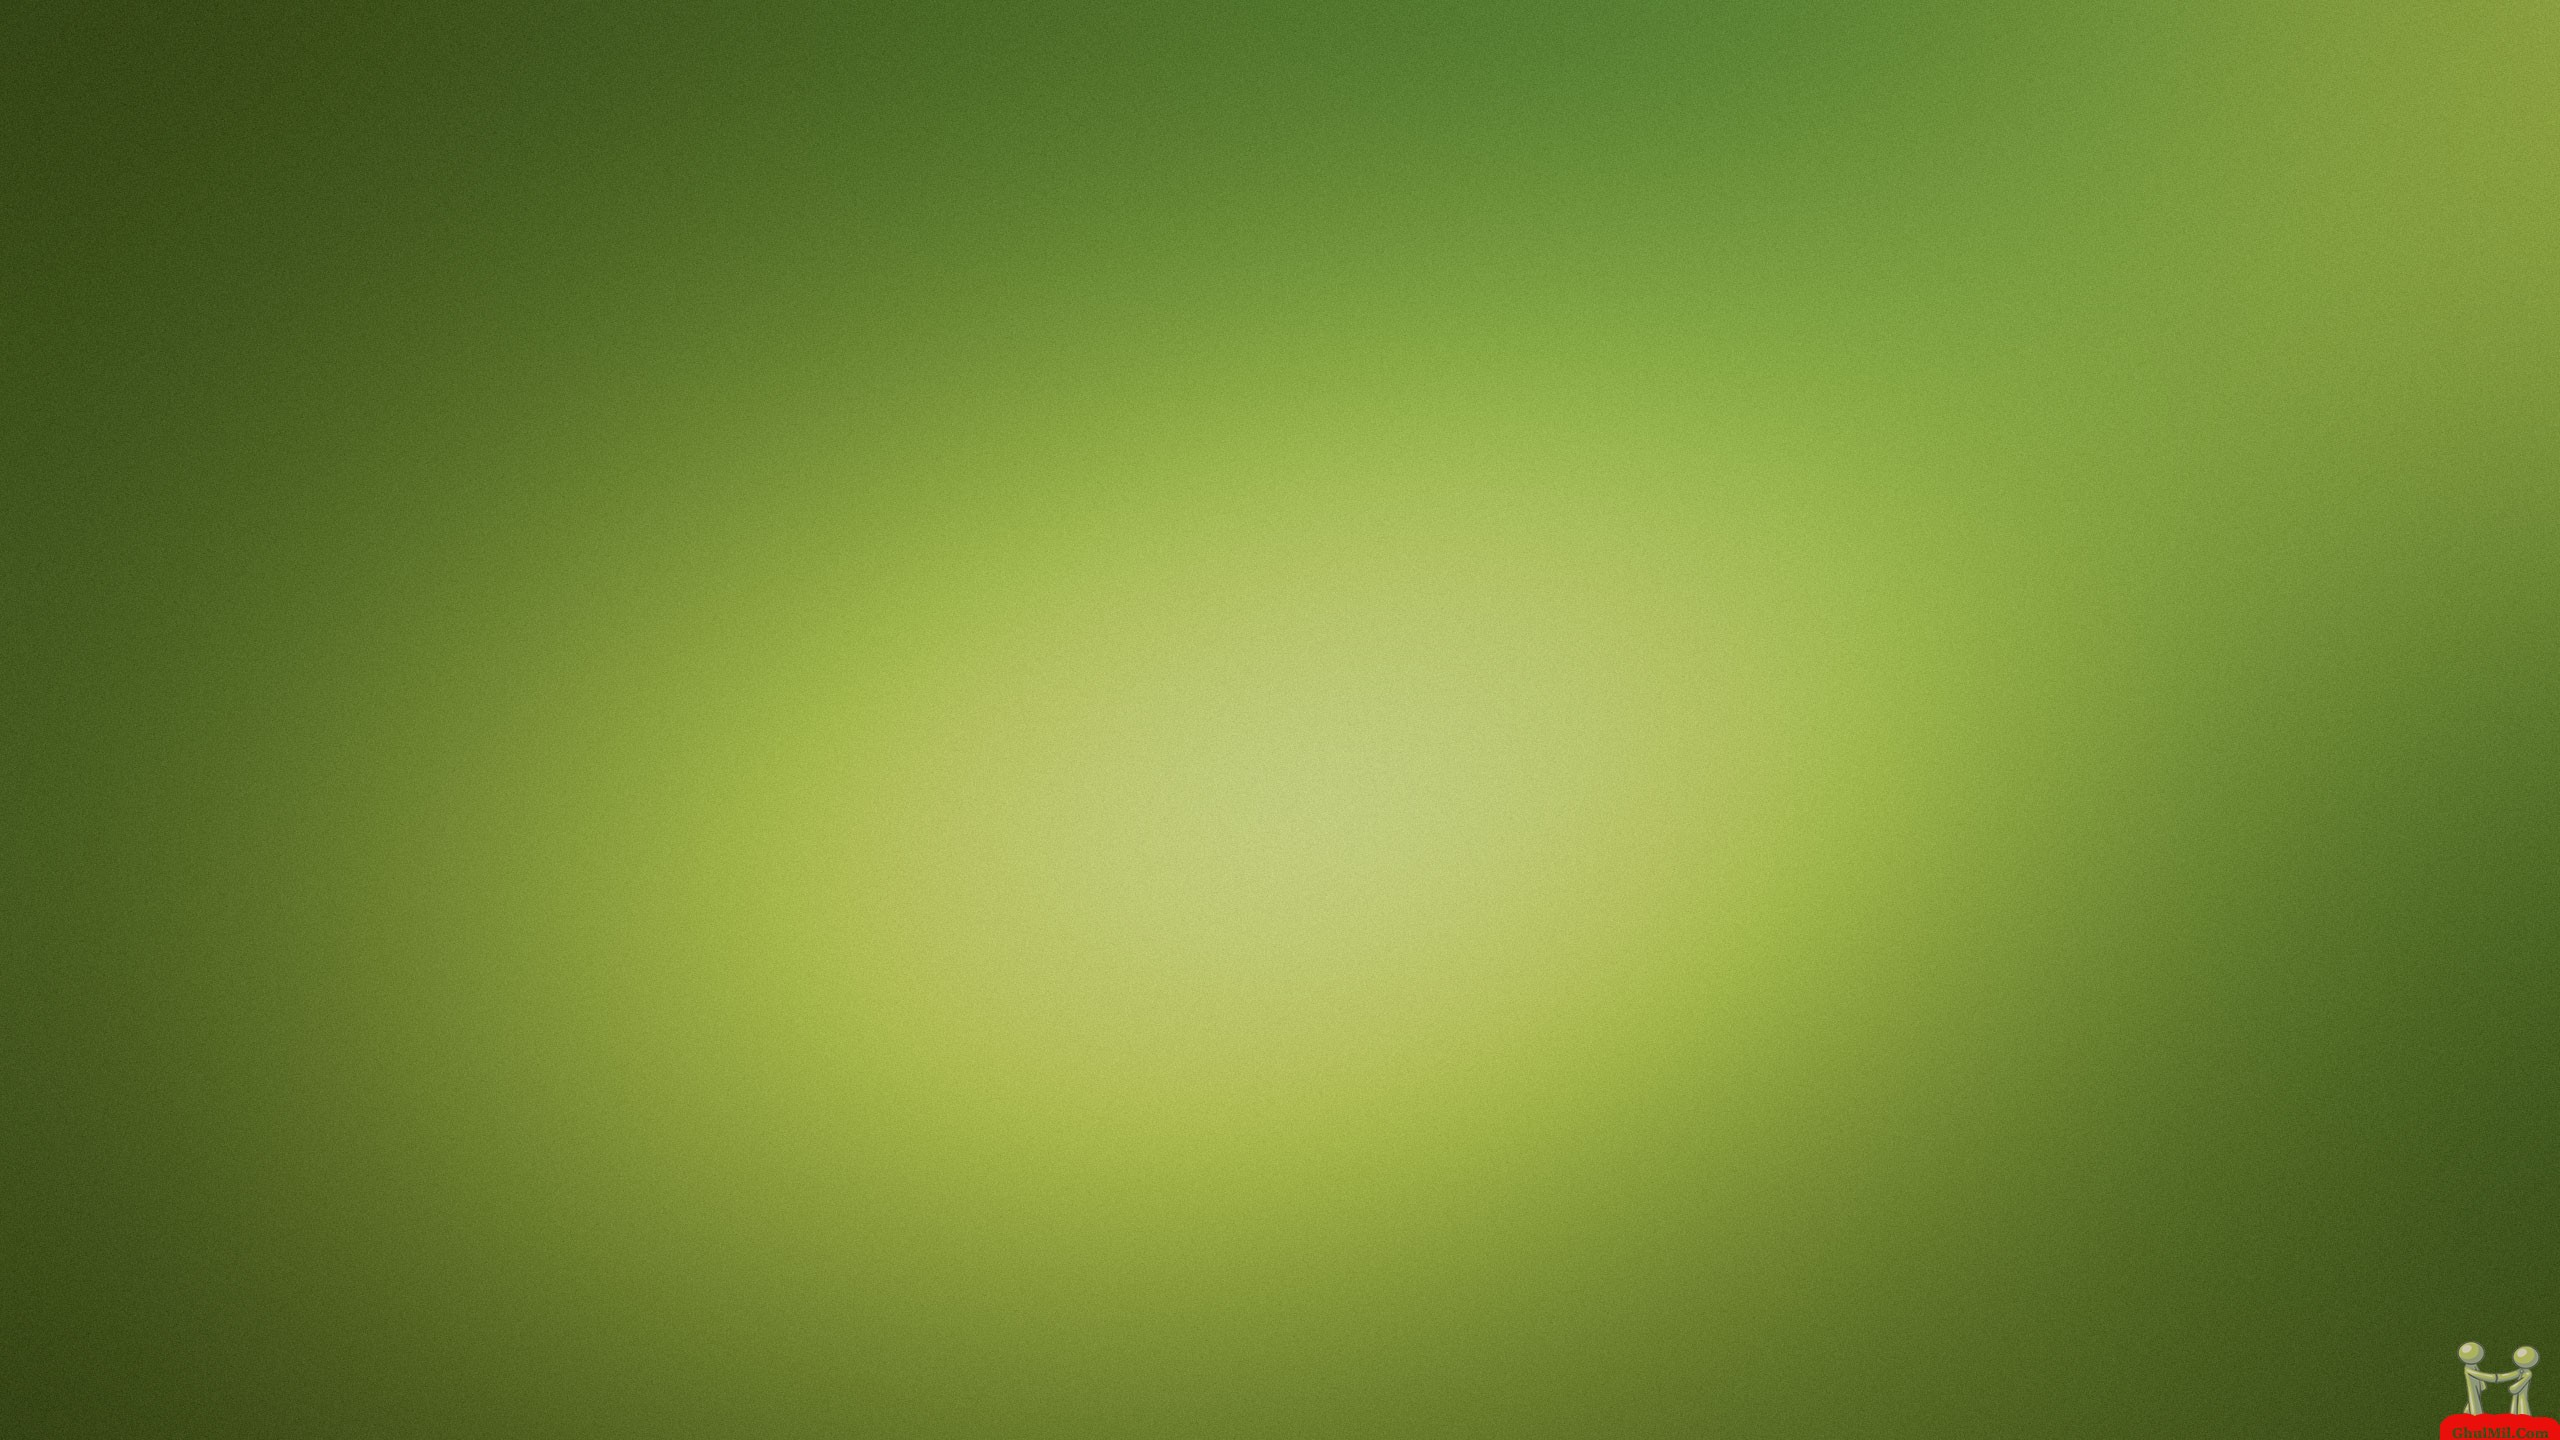 Beautiful Shiny Green HD Wallpaper E Entertainment 2560x1440